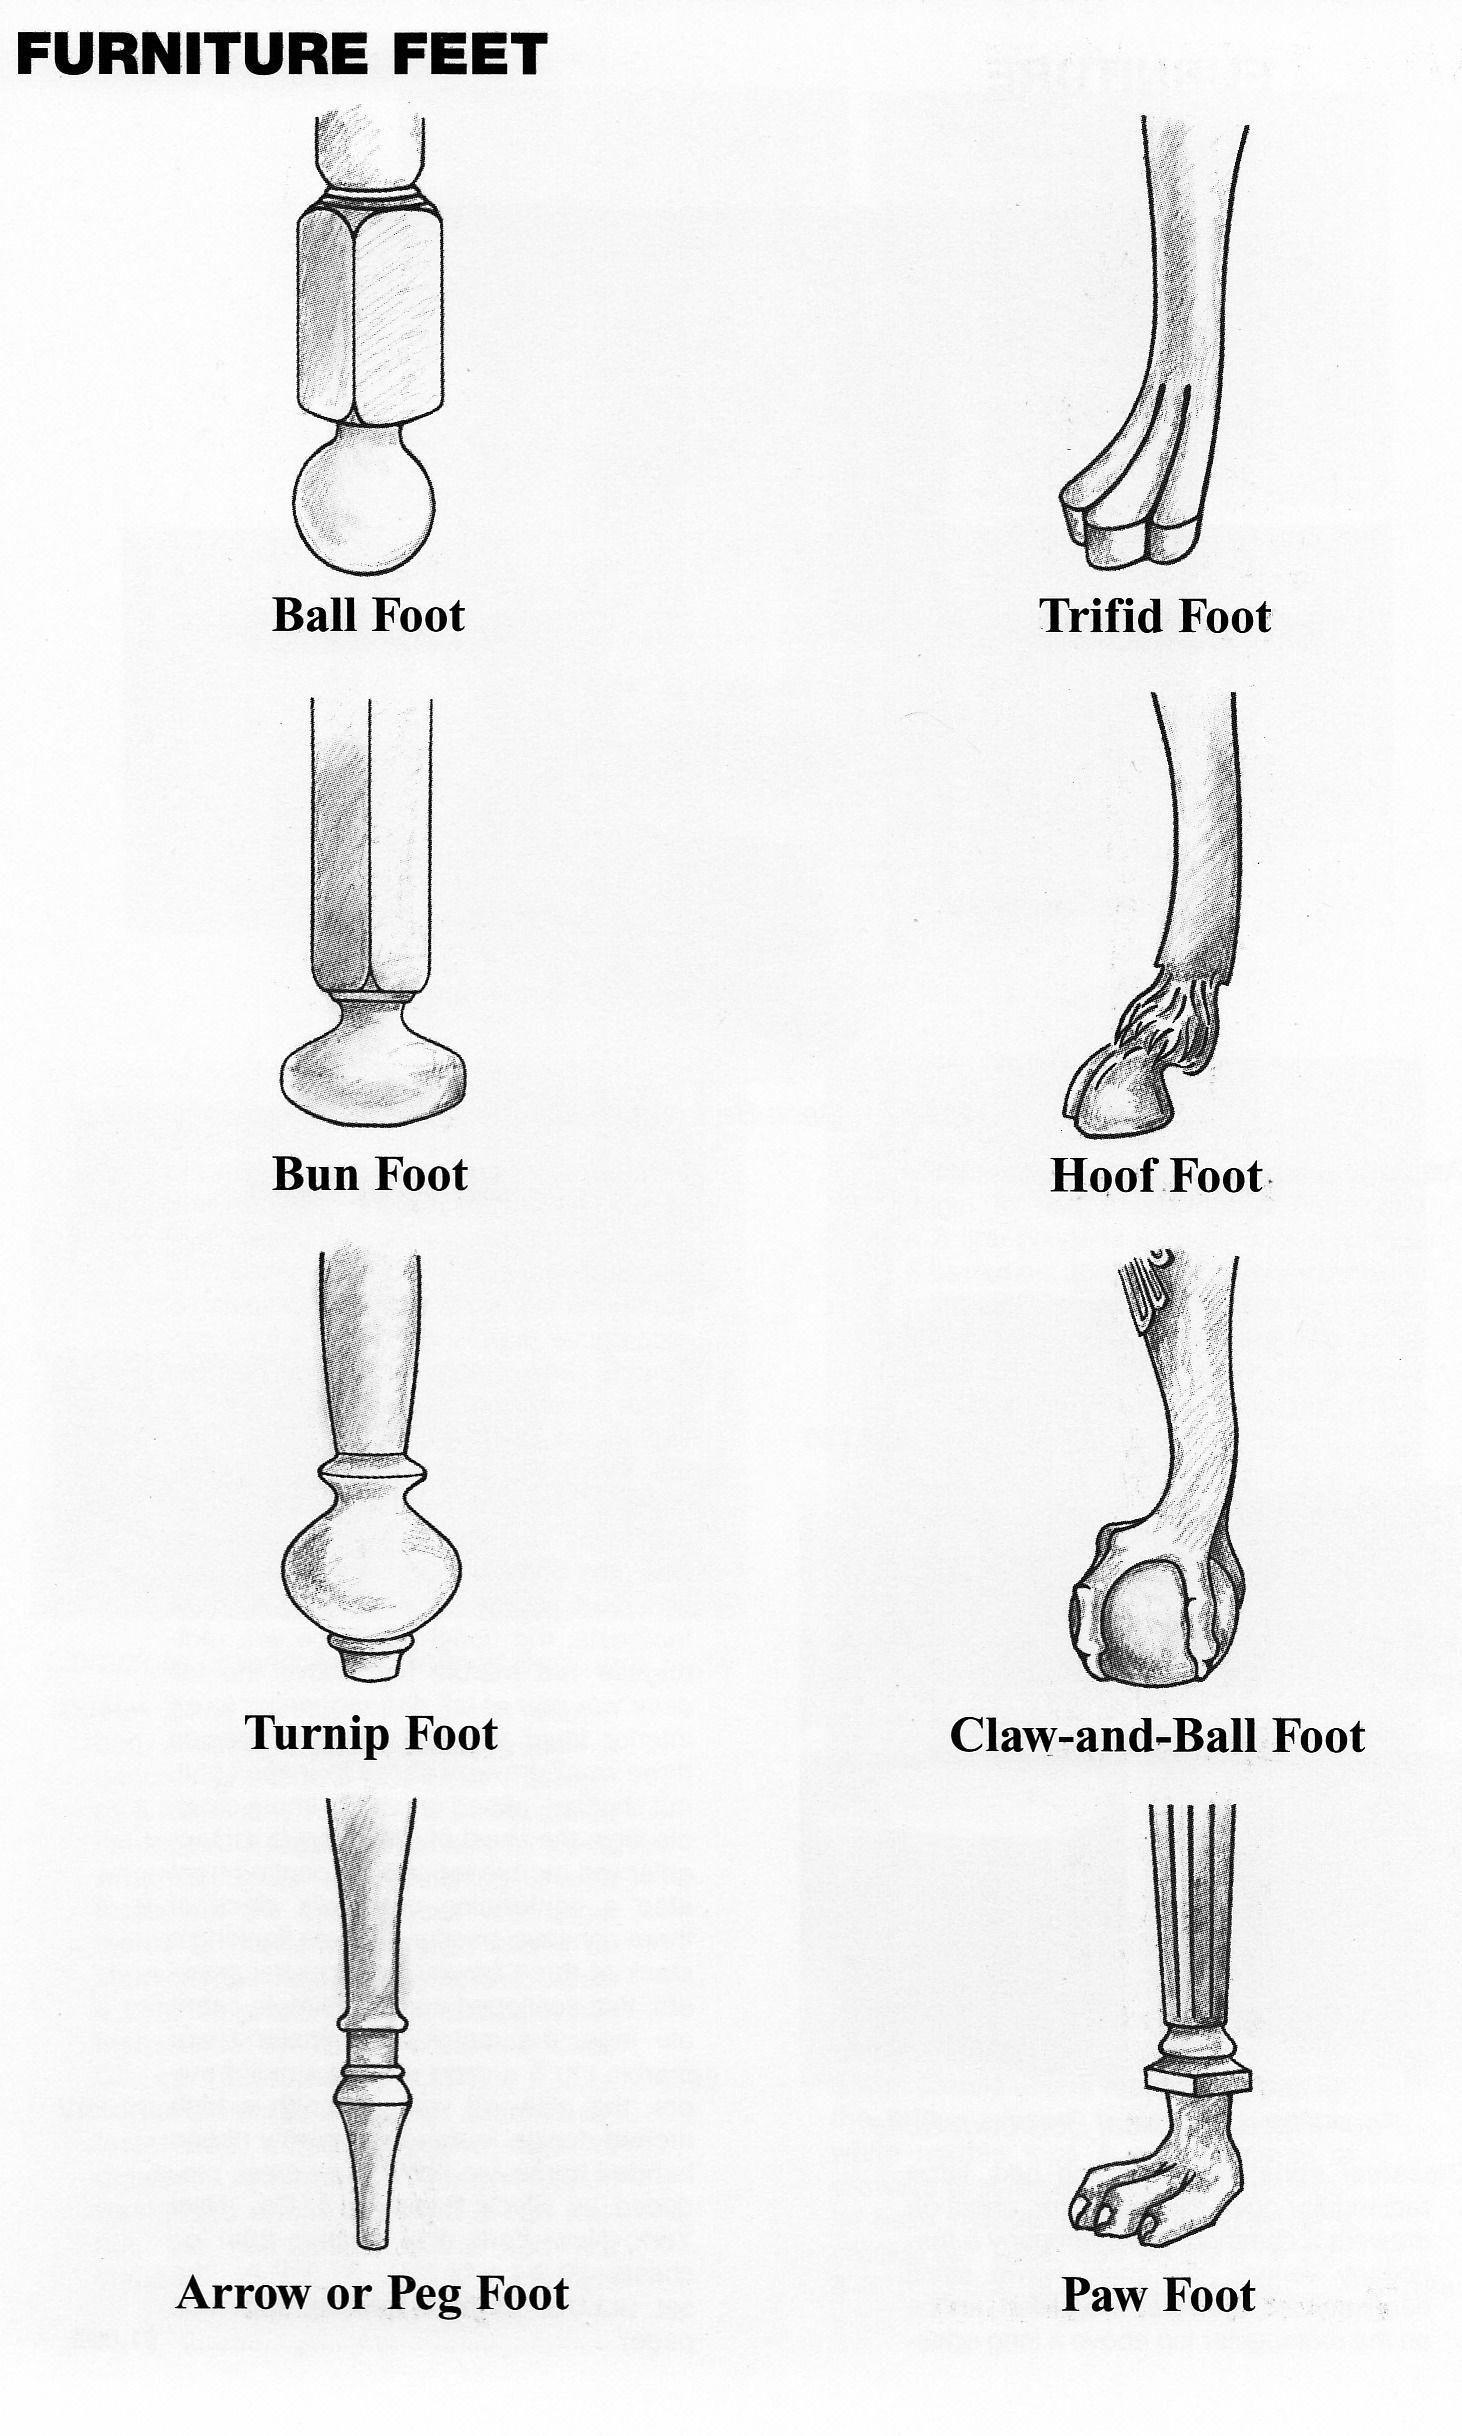 Diagrams Of Furniture Feet Legsforfurniture